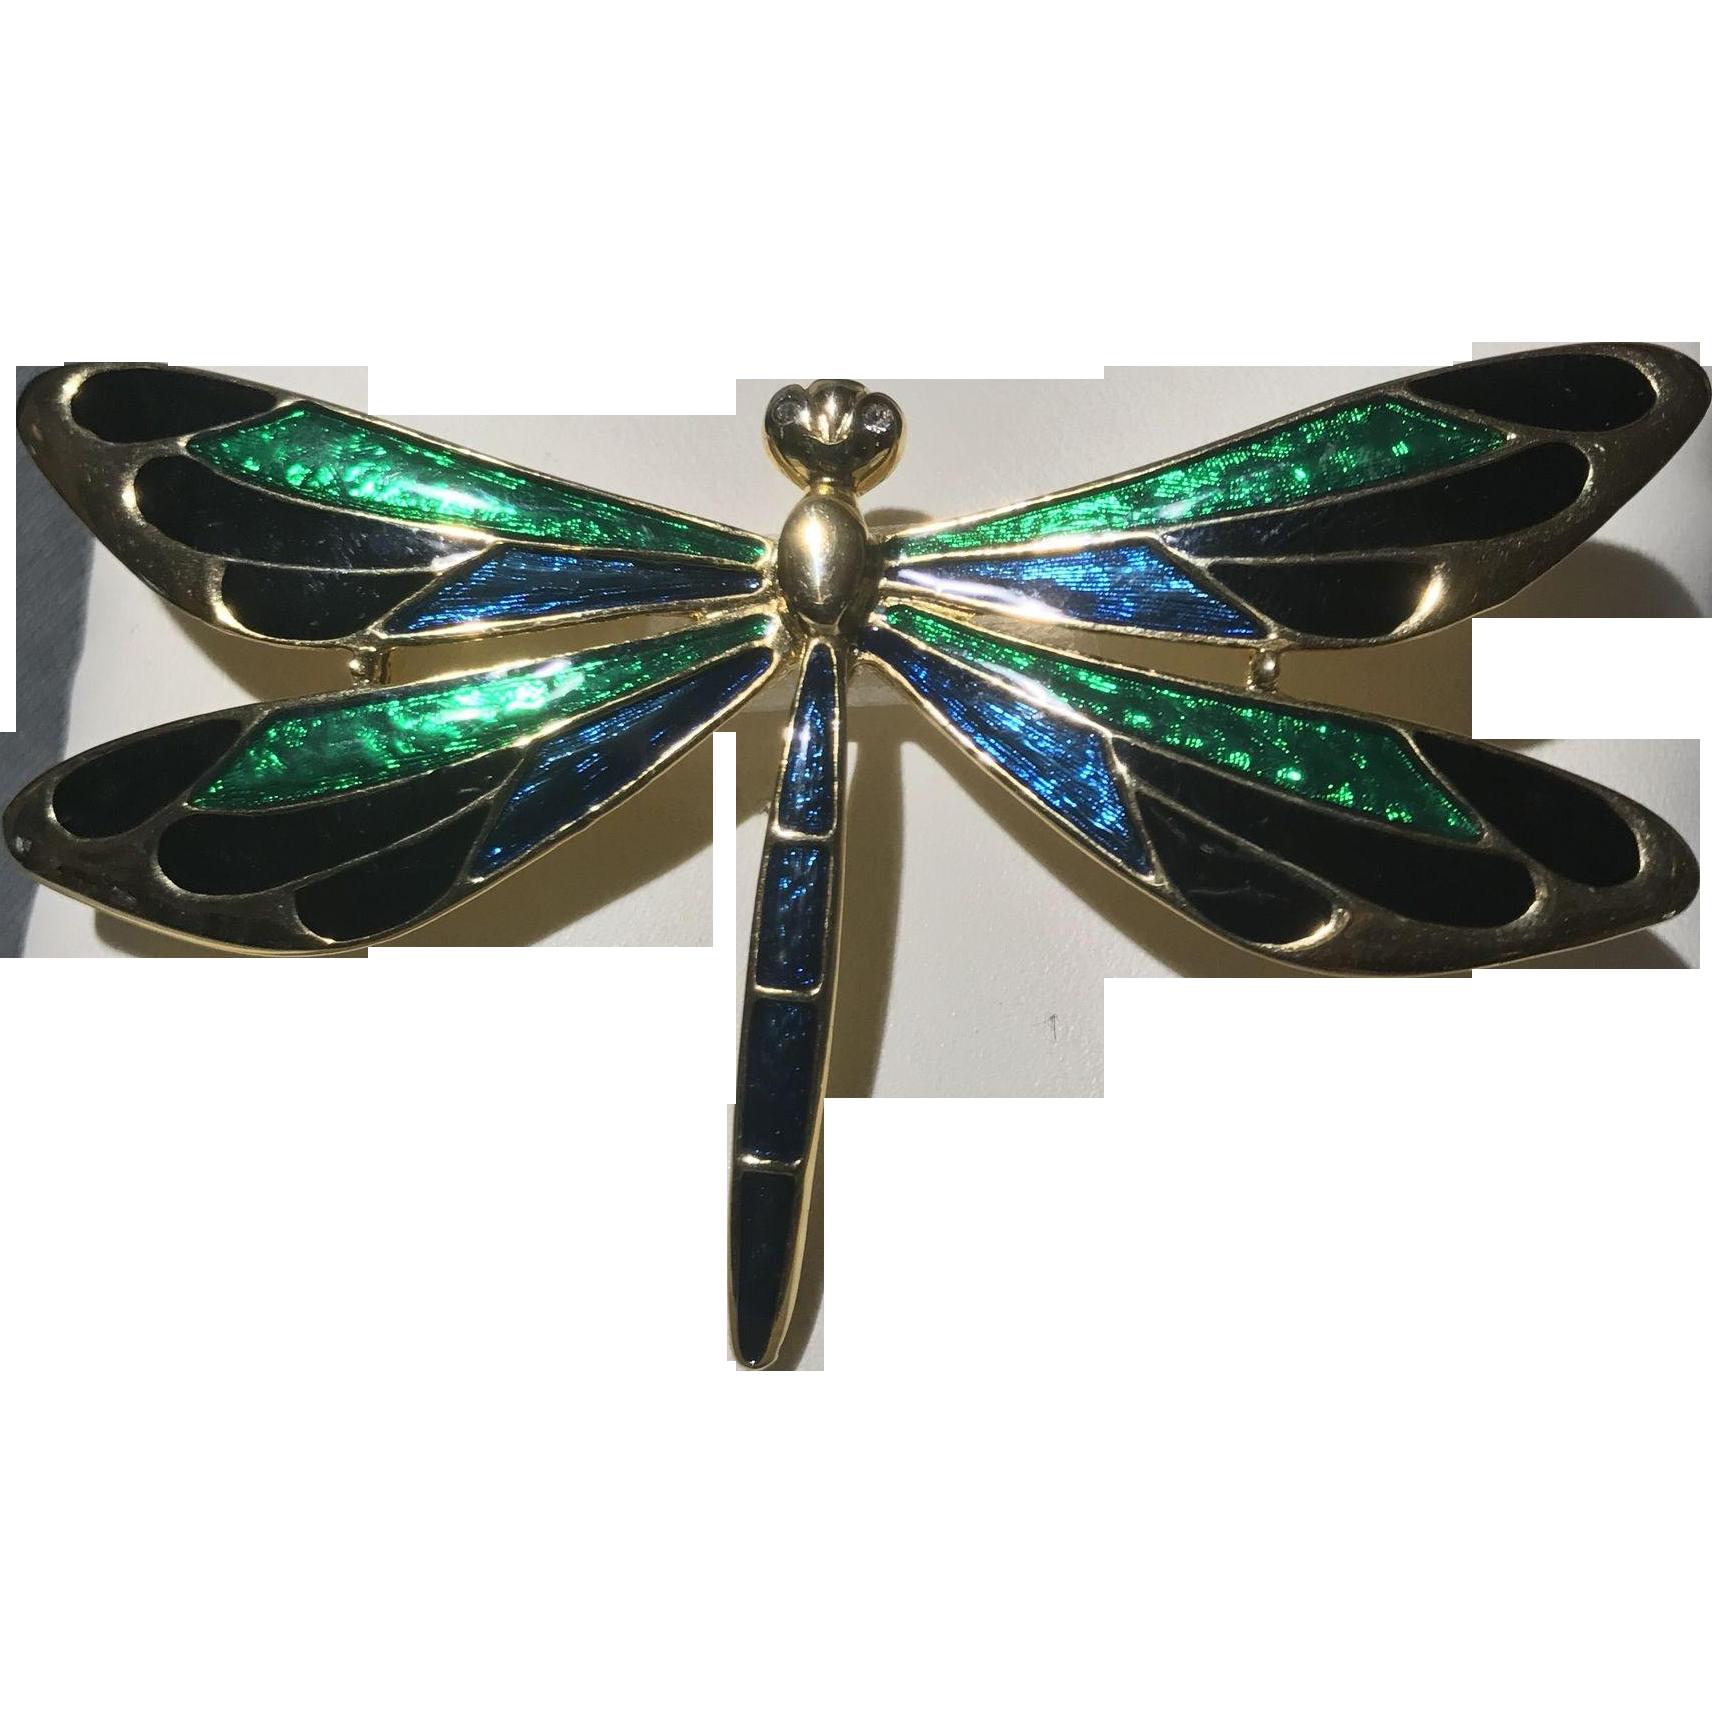 "Vintage Dragonfly Brooch/Pin Goldtone Enamel Green, Blue, Black 3"" Wide"